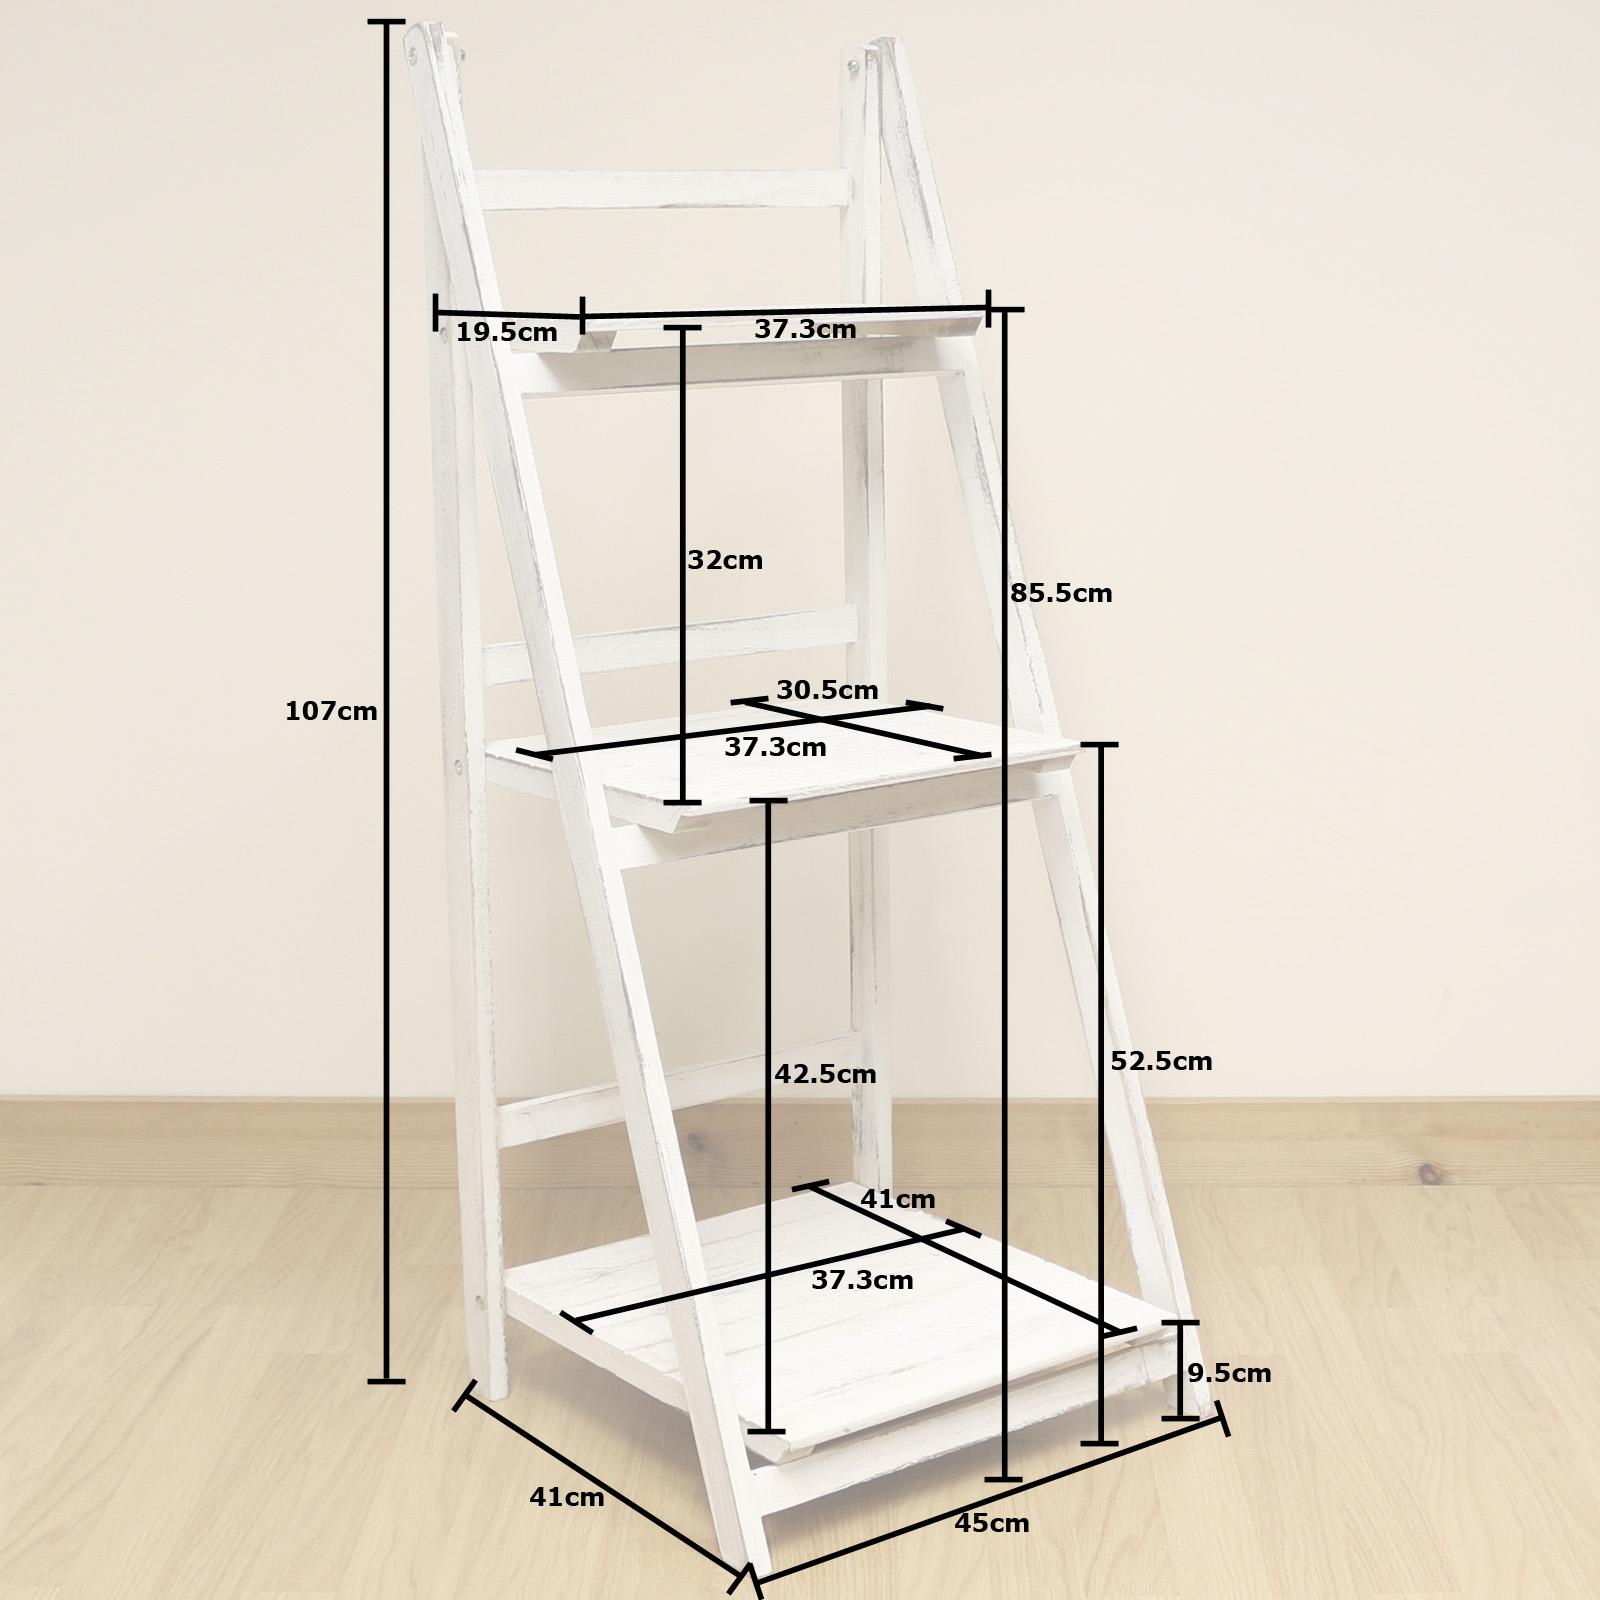 3 tier white wash ladder shelf display unit free standing folding bookshelves furniture folding bookshelves furniture